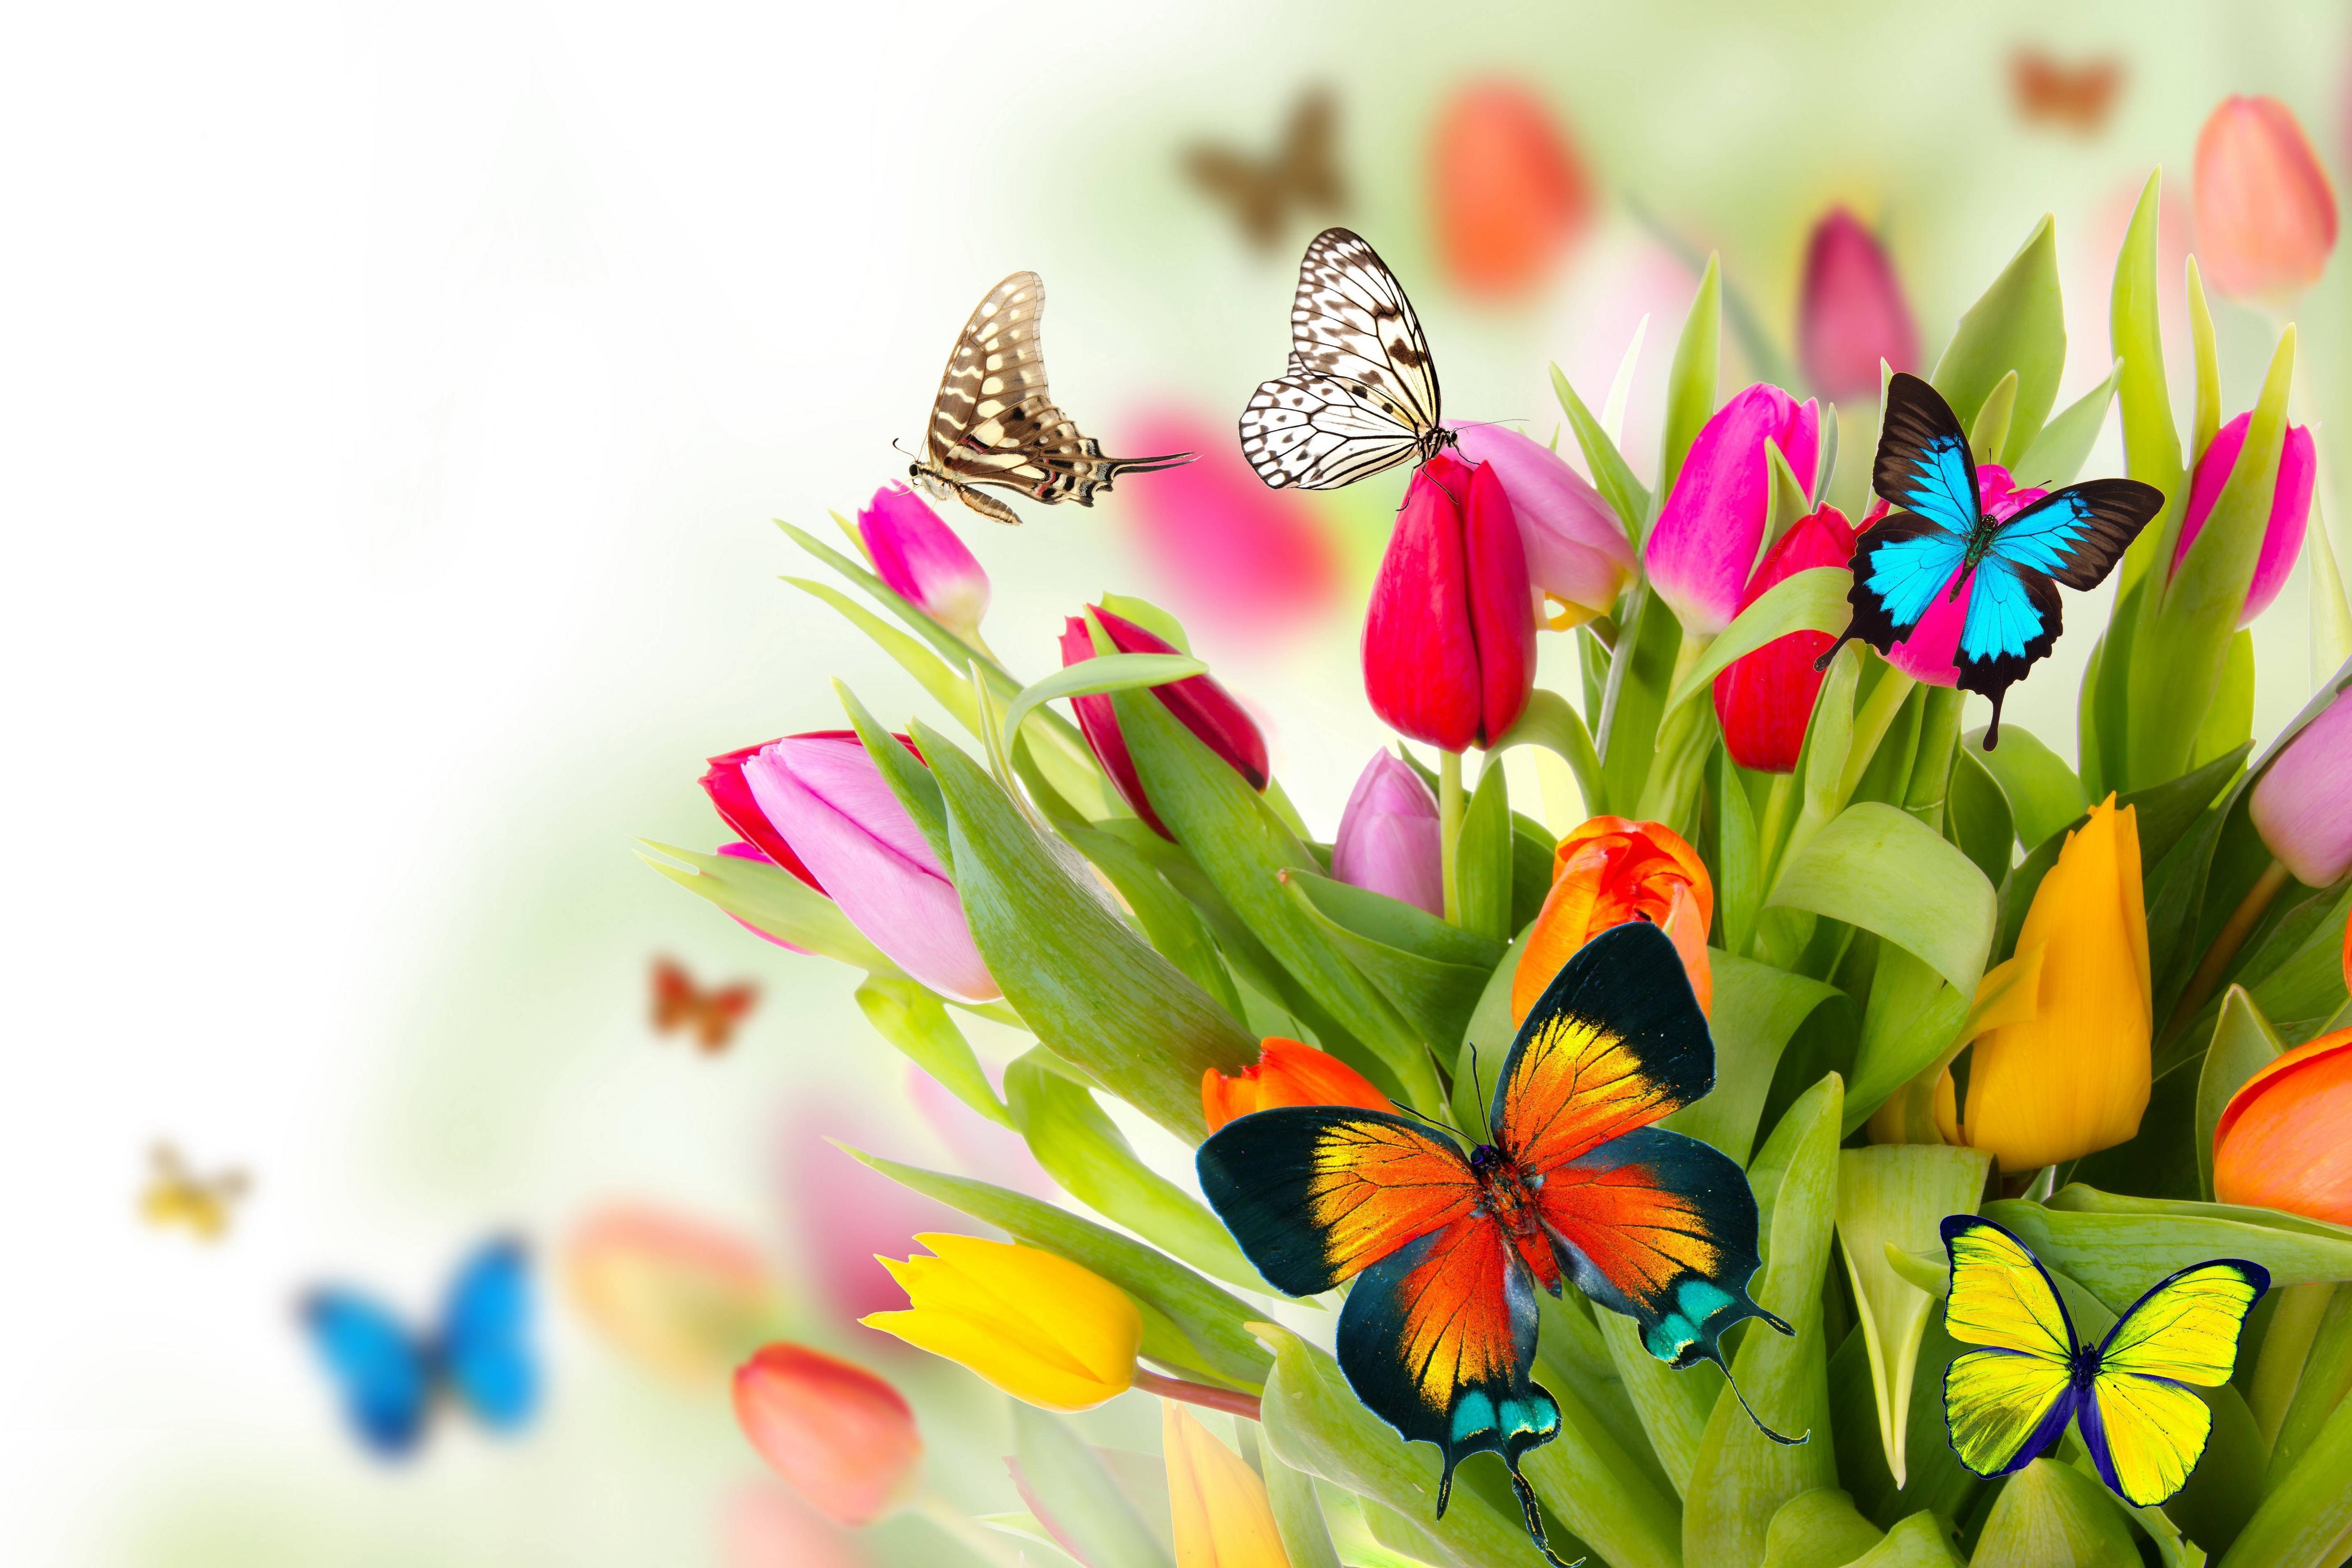 Best Wallpaper Desktop Background Flowers Full Hd Pics Backgrounds